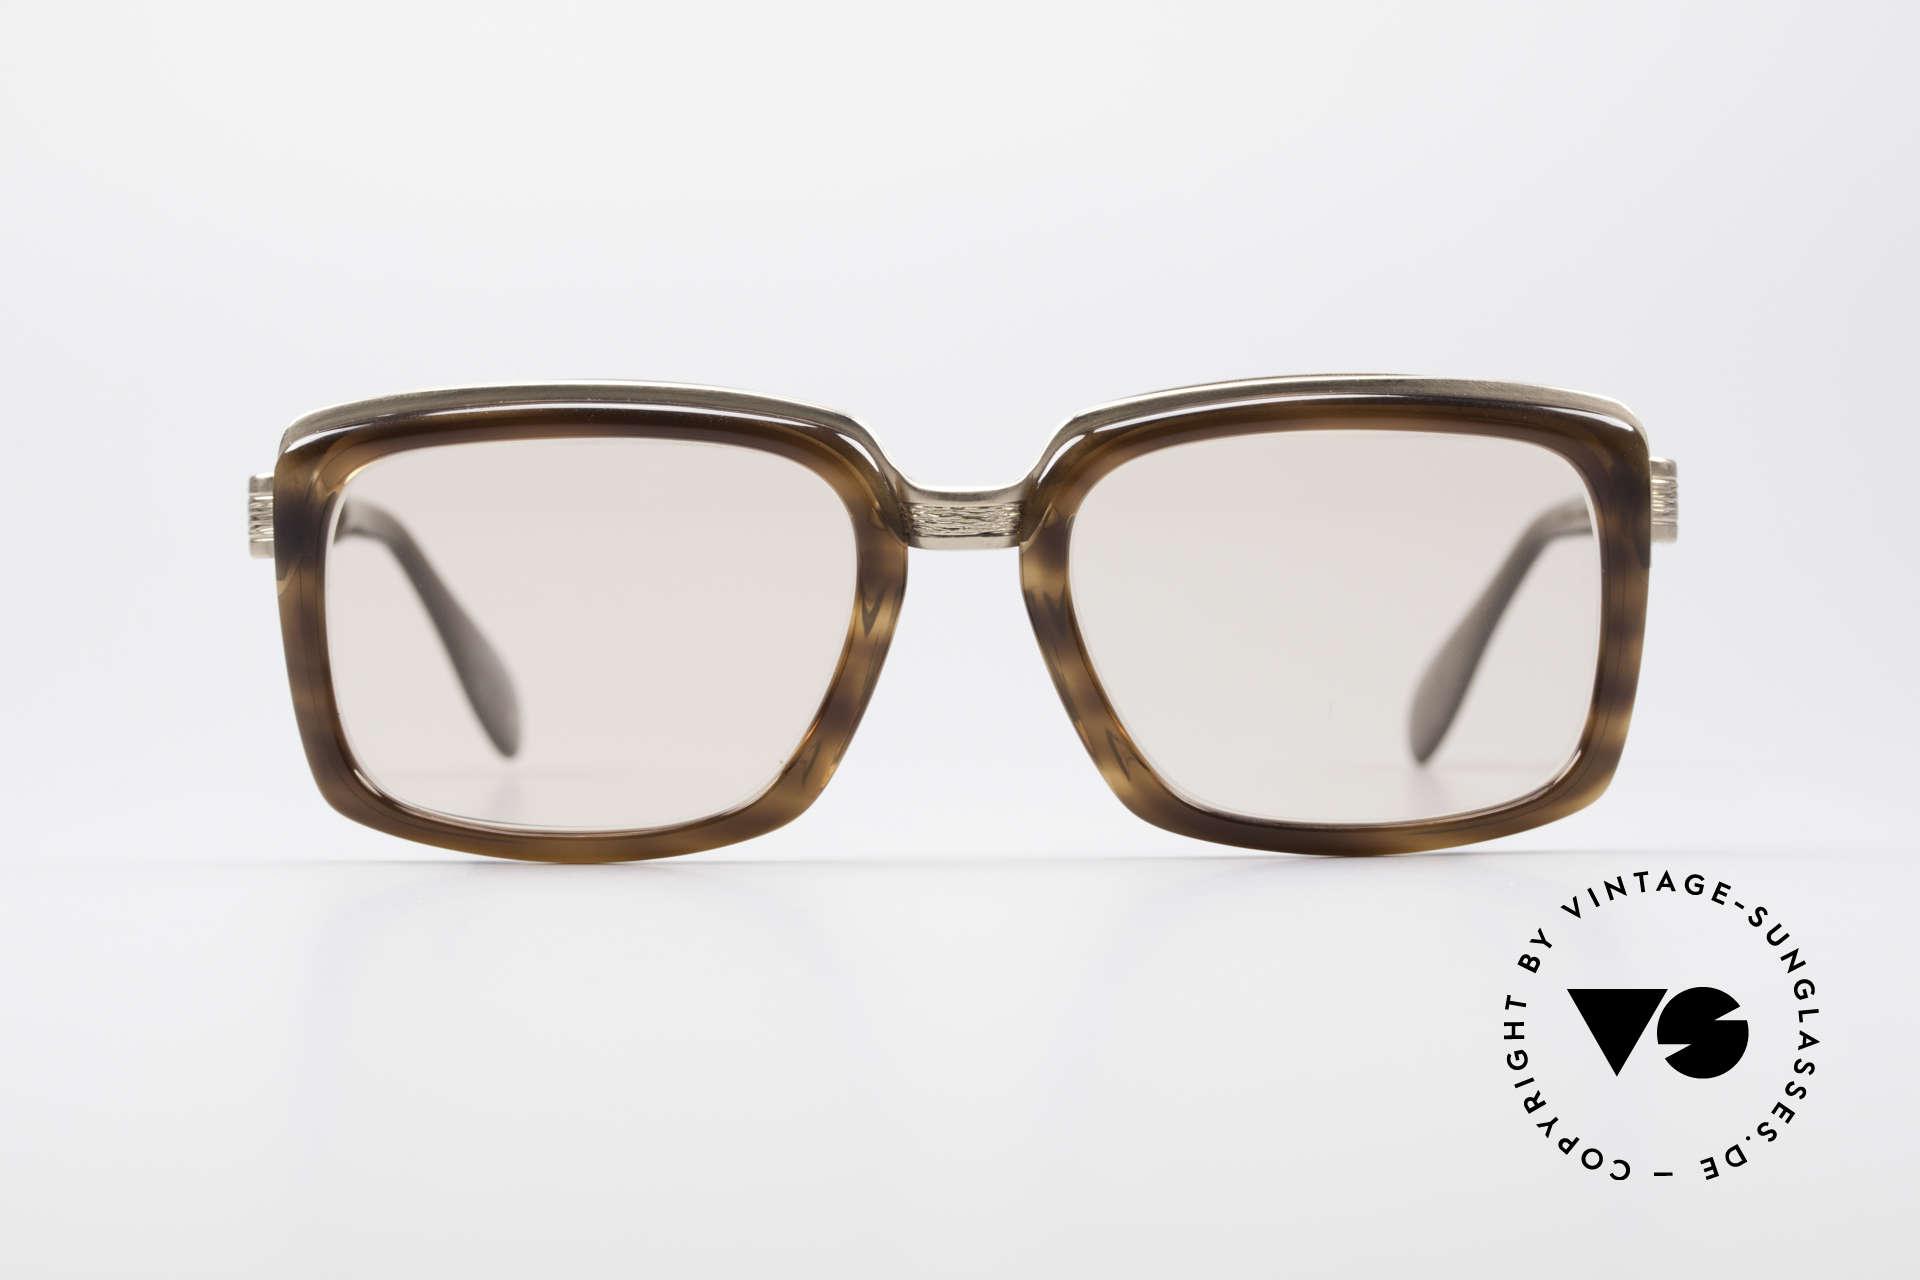 488263466e Sunglasses Metzler 6530 Gold Filled Vintage Frame